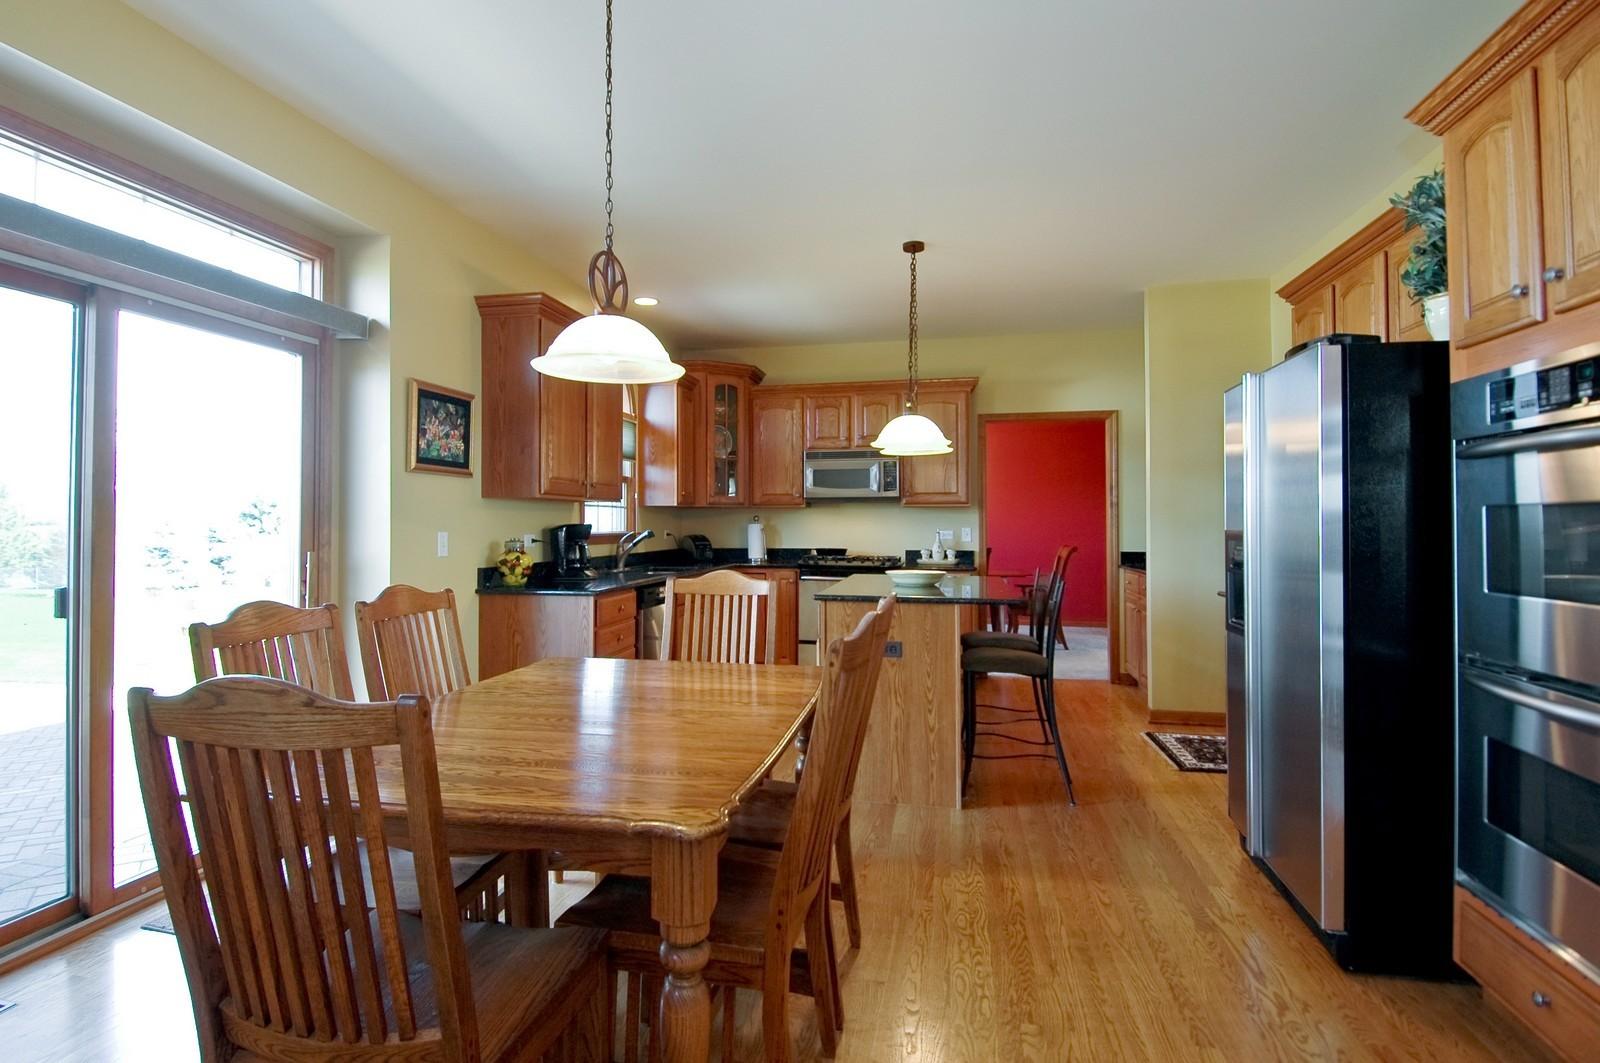 Real Estate Photography - 491 Clover, Algonquin, IL, 60102 - Kitchen